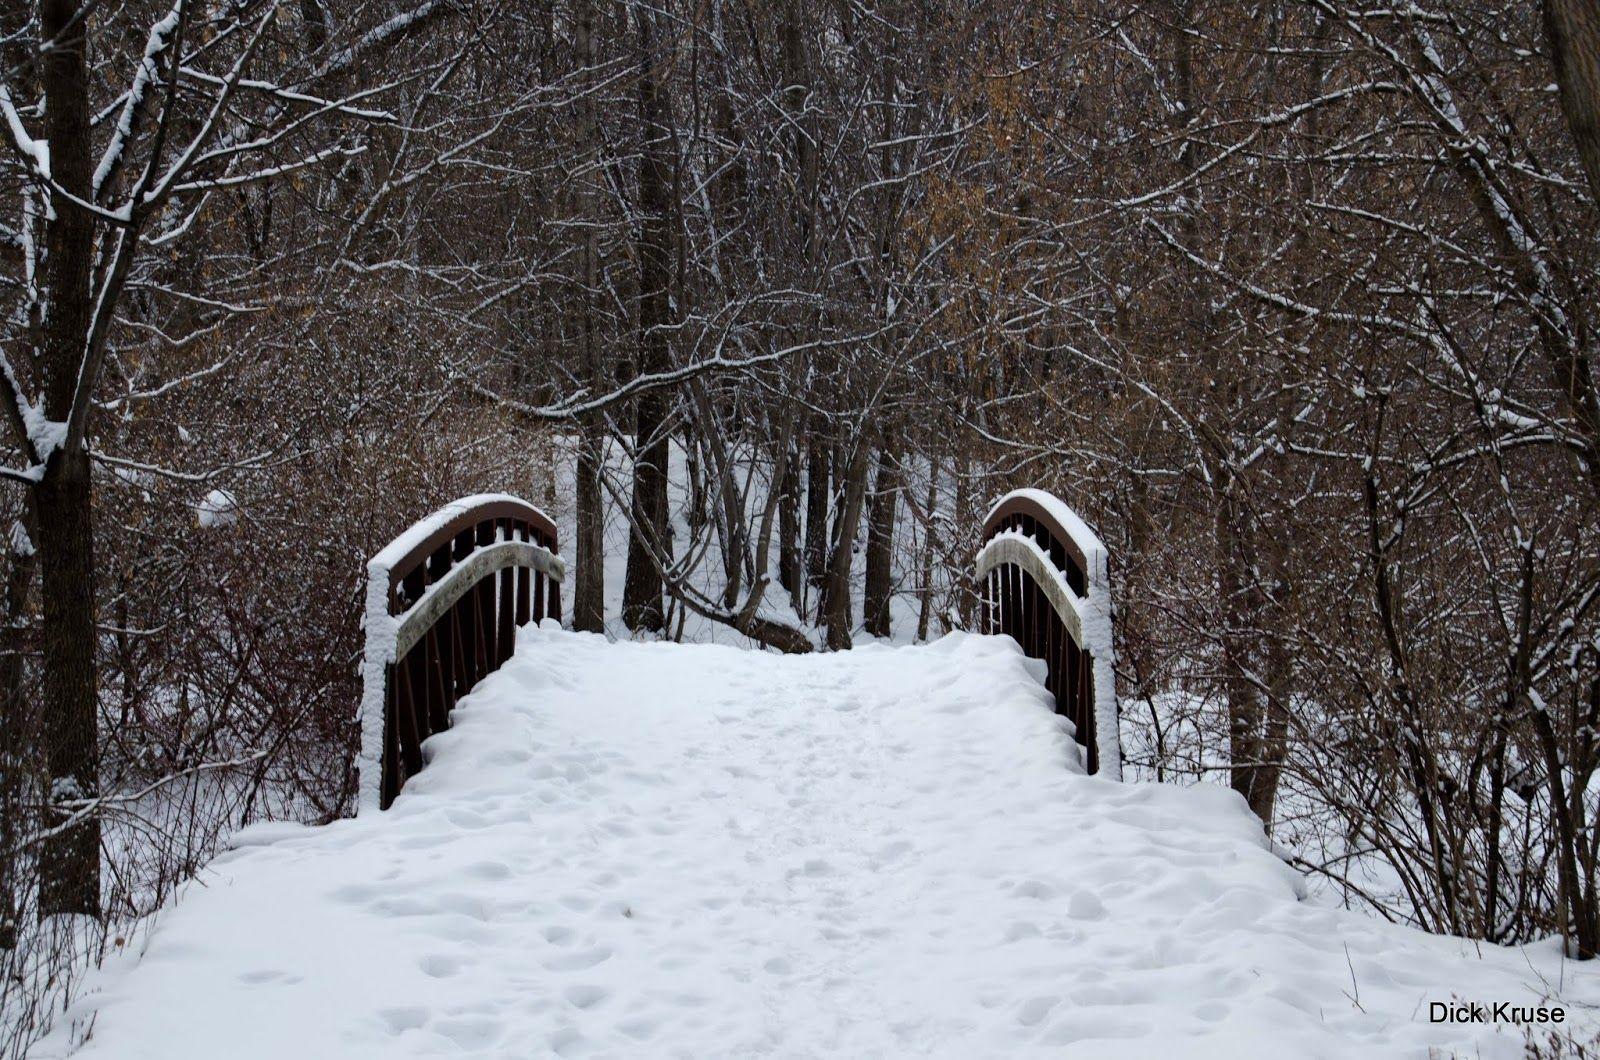 The Dick Kruse 365 Project: December 28, 2012 - Winter Walk